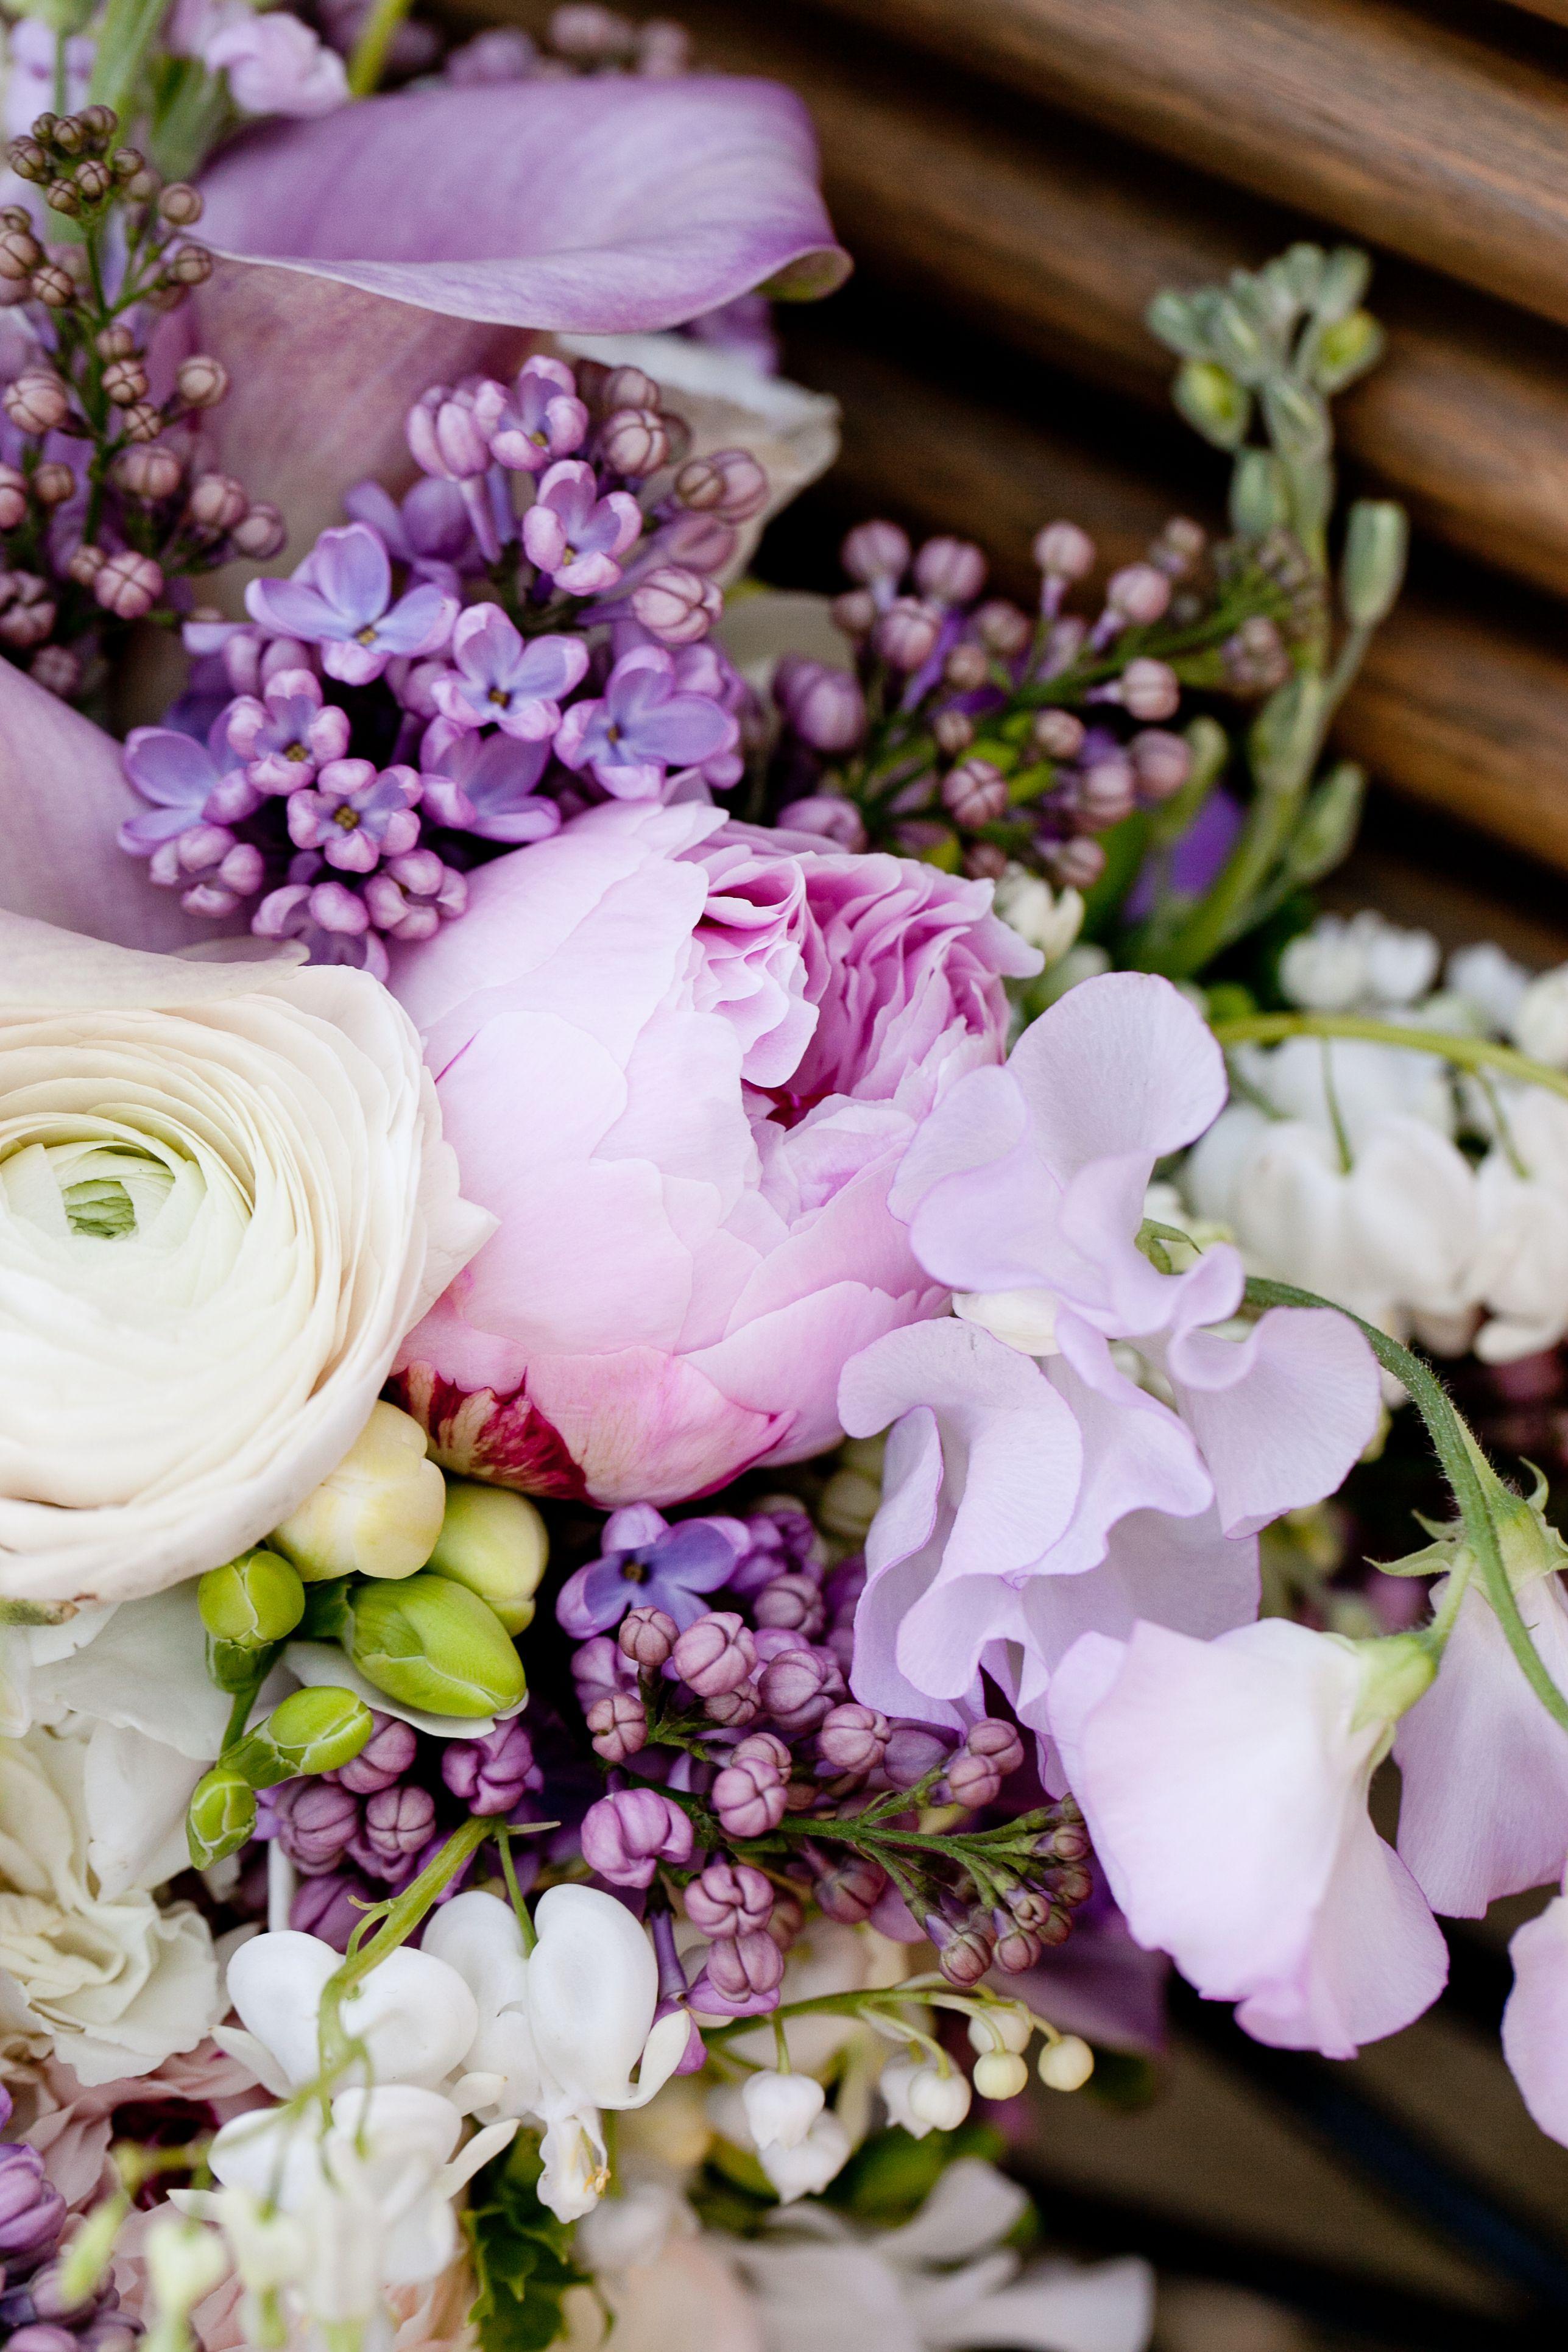 Rose, ranunculus, lilac, calla lily, bleeding heart